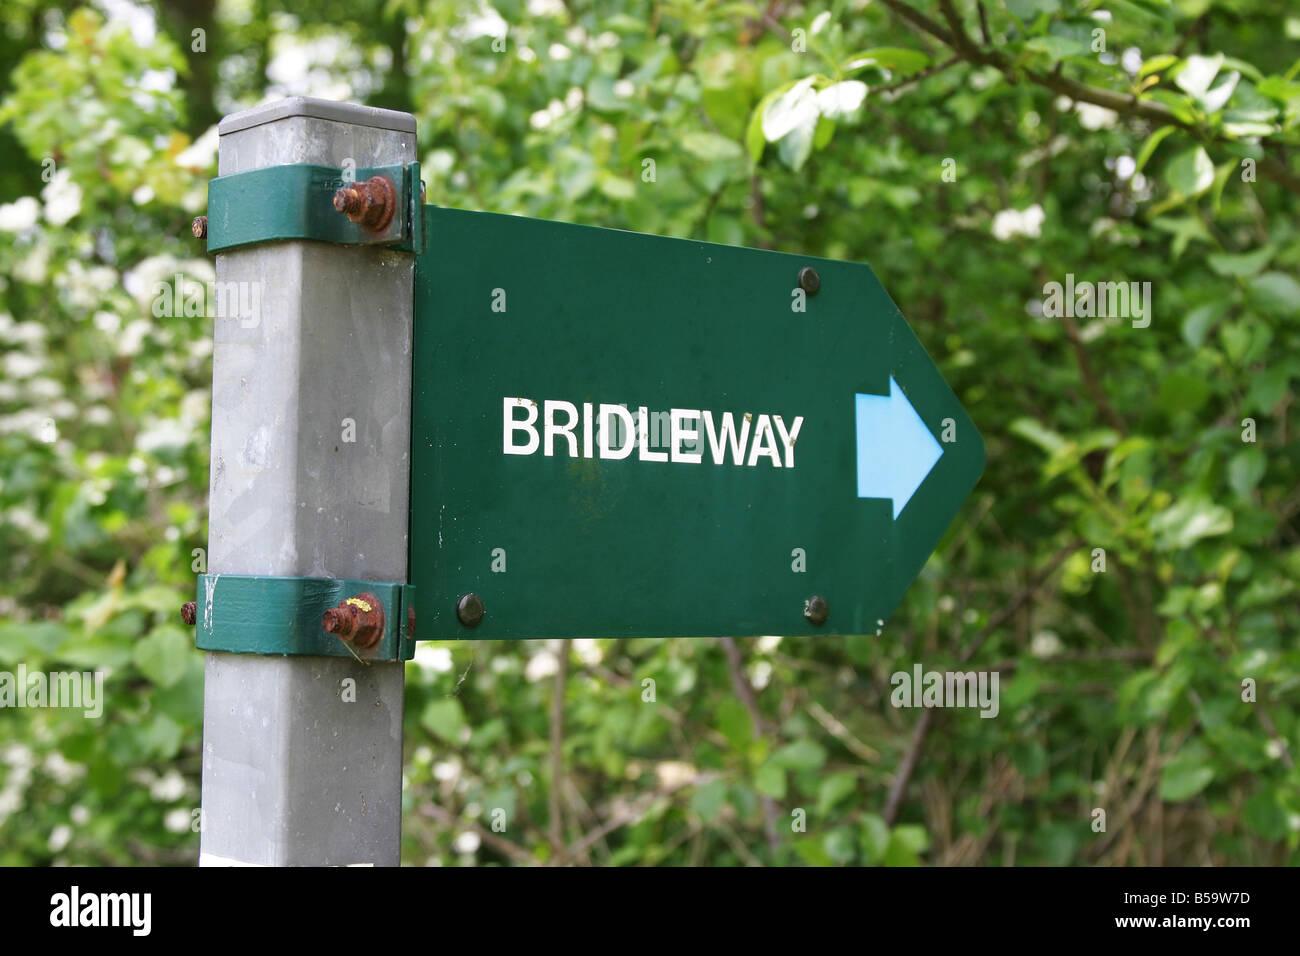 Bridleway sign - Stock Image